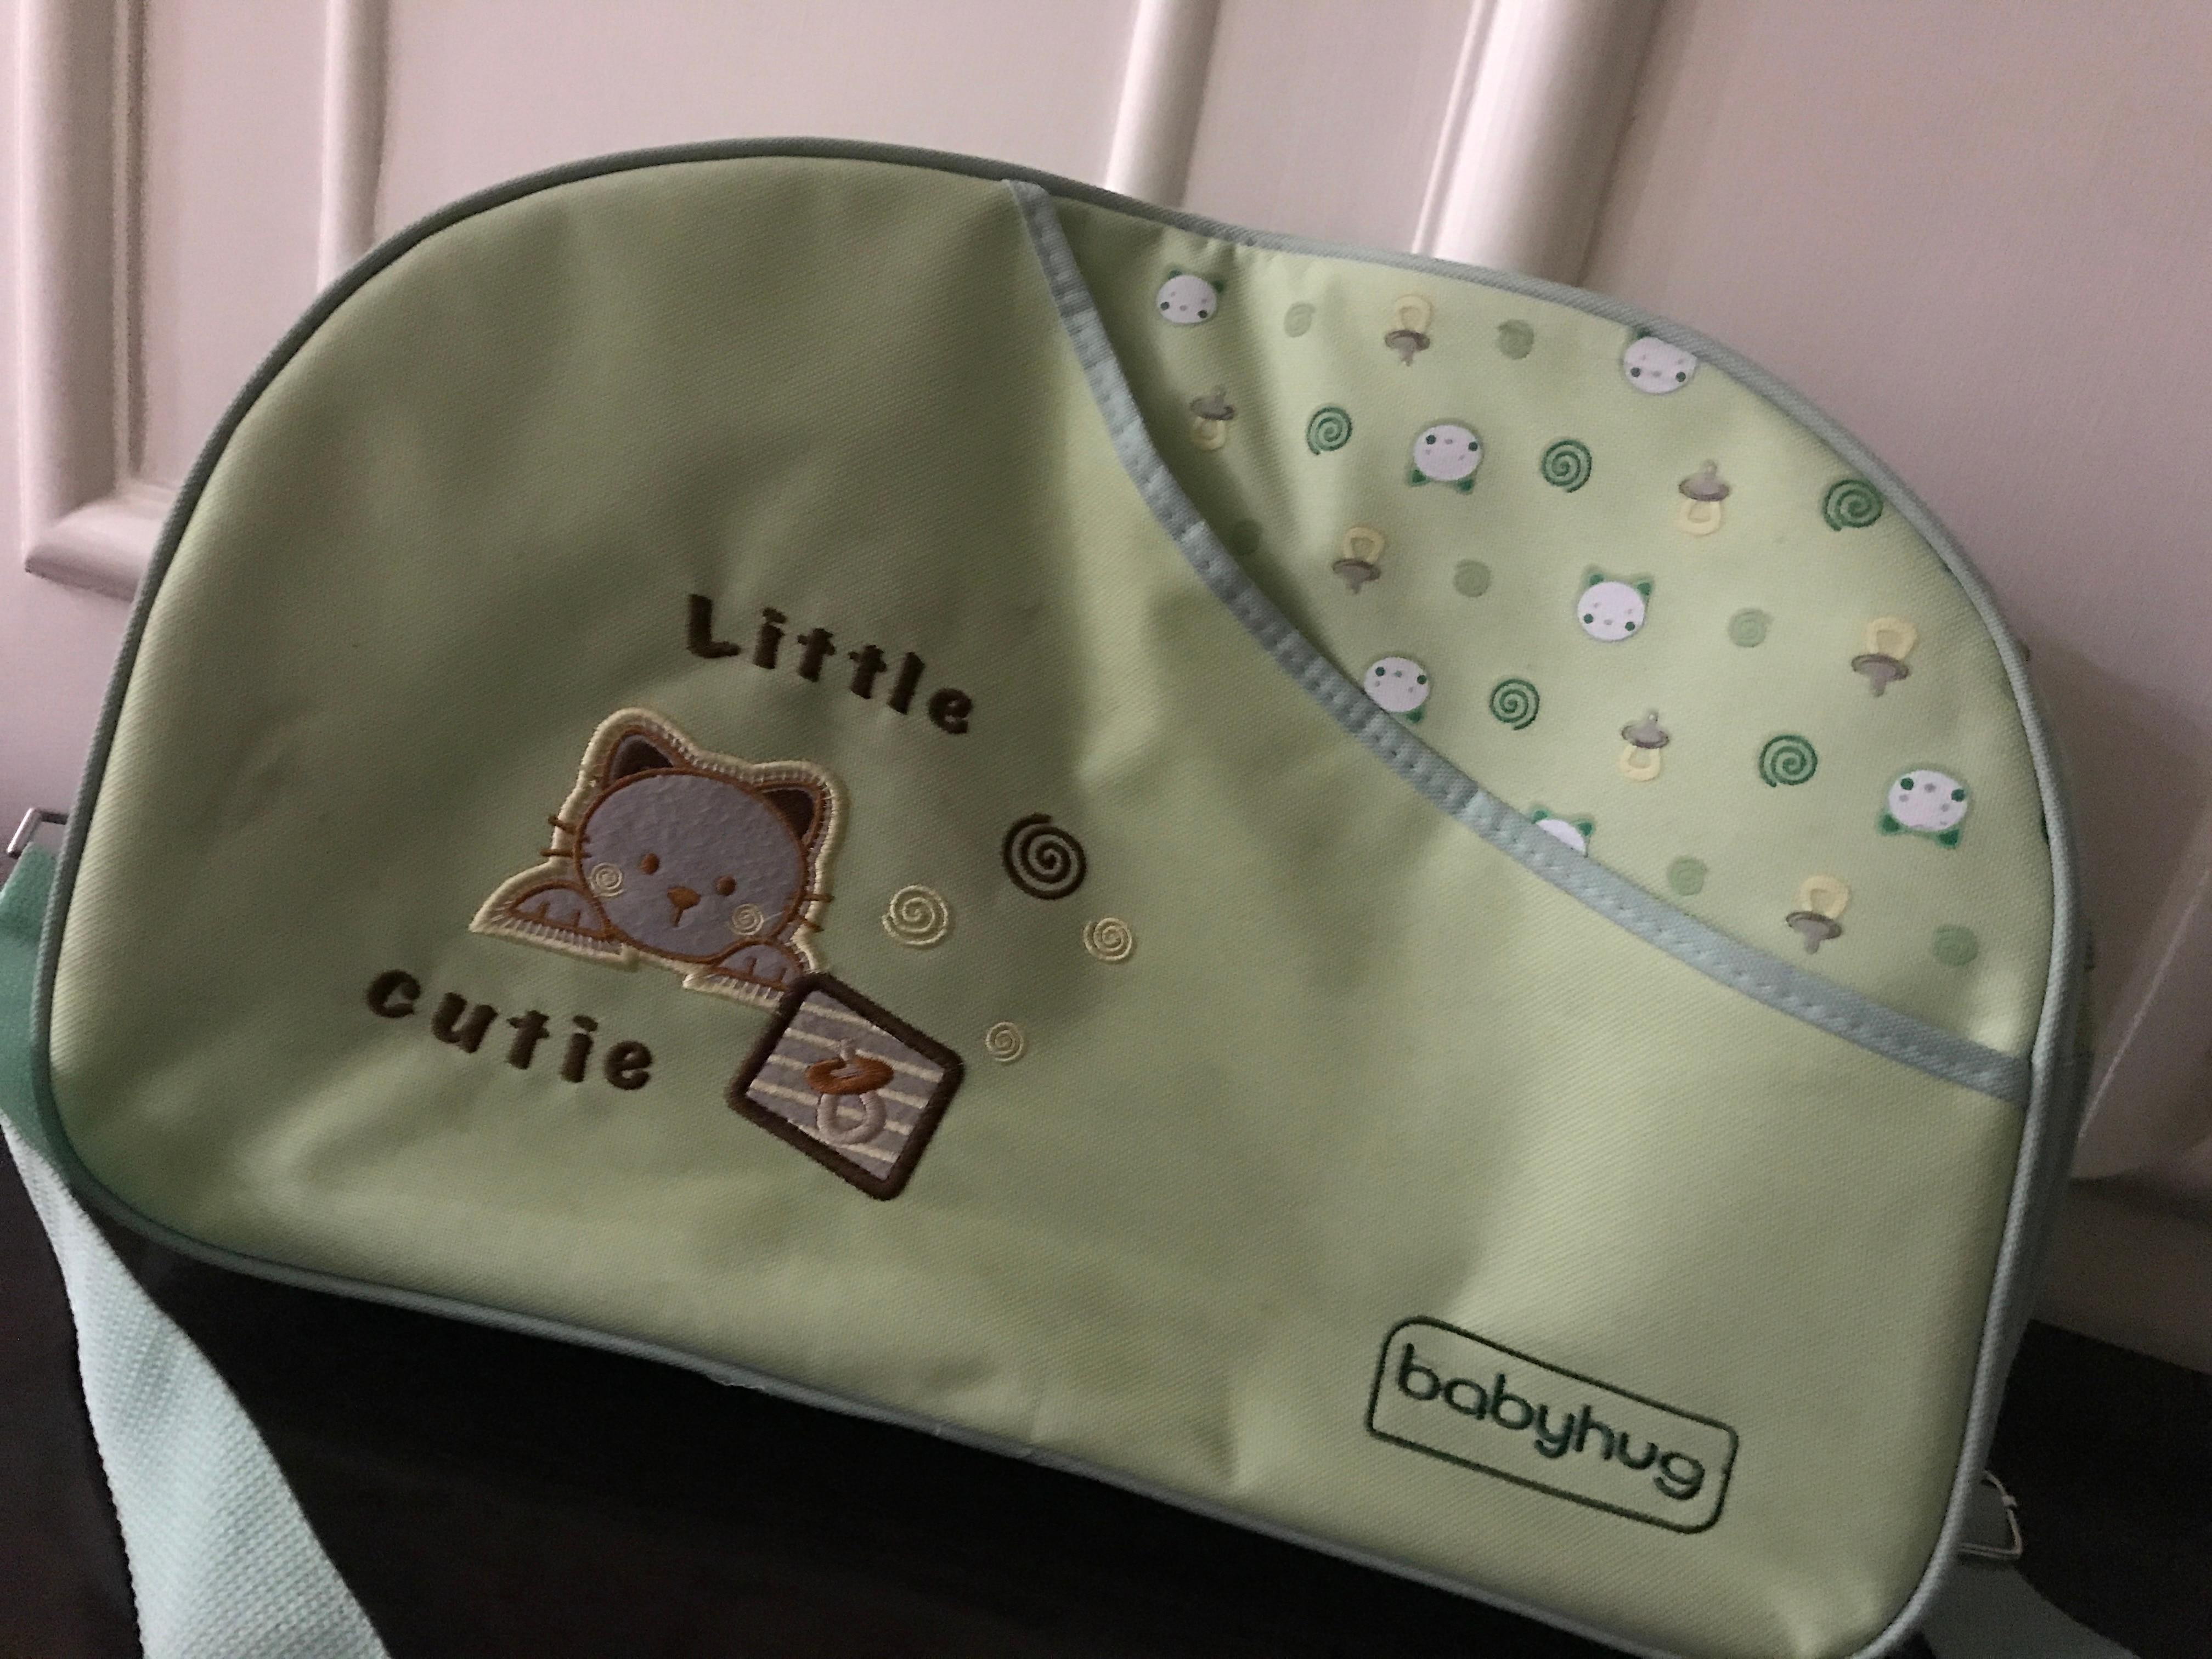 Babyhug Diaper Bag With Changing Mat-Fancy and useful-By saundaraya